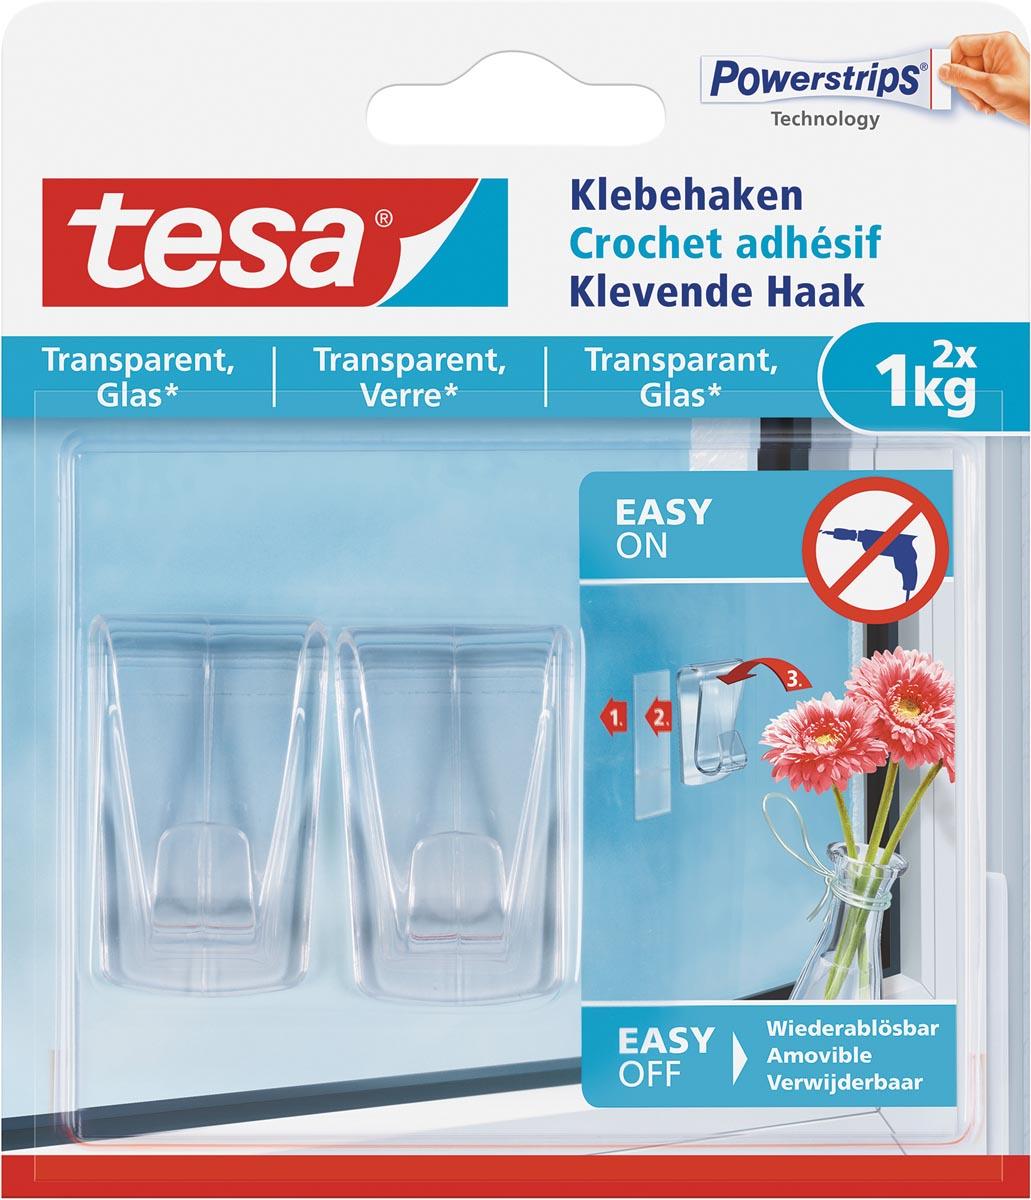 Tesa Klevende haak voor Transparant en Glas, draagvermogen 1 kg, blister van 2 stuks